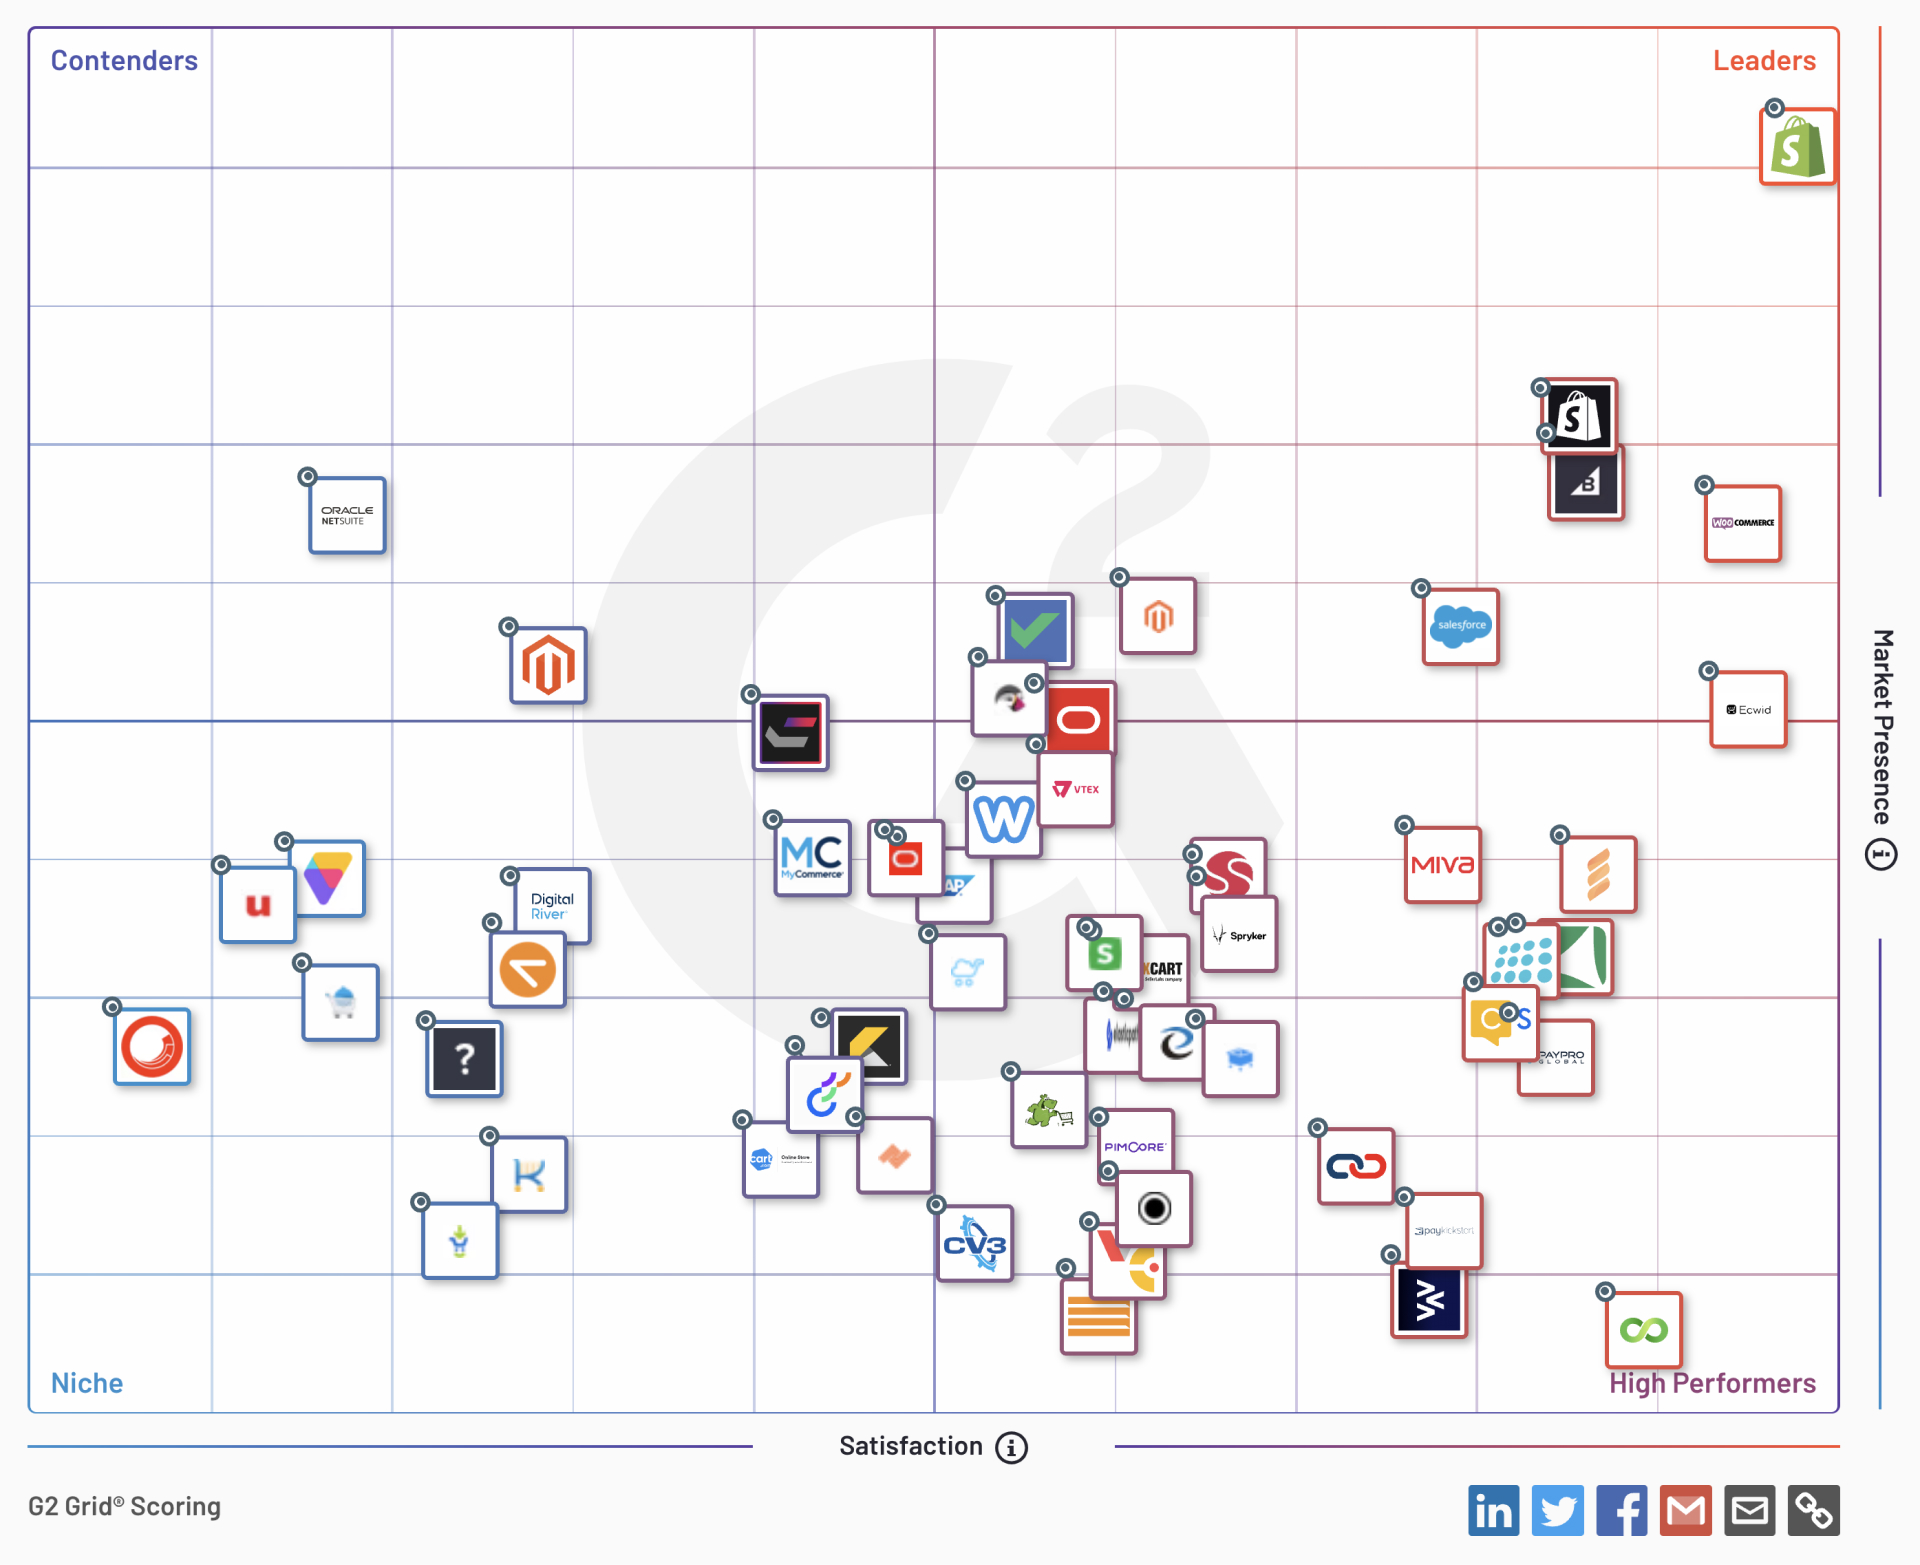 Best eCommerce Platforms of 2021-G2-數據查詢時間-20210901-IrvingLab 爾文實驗室